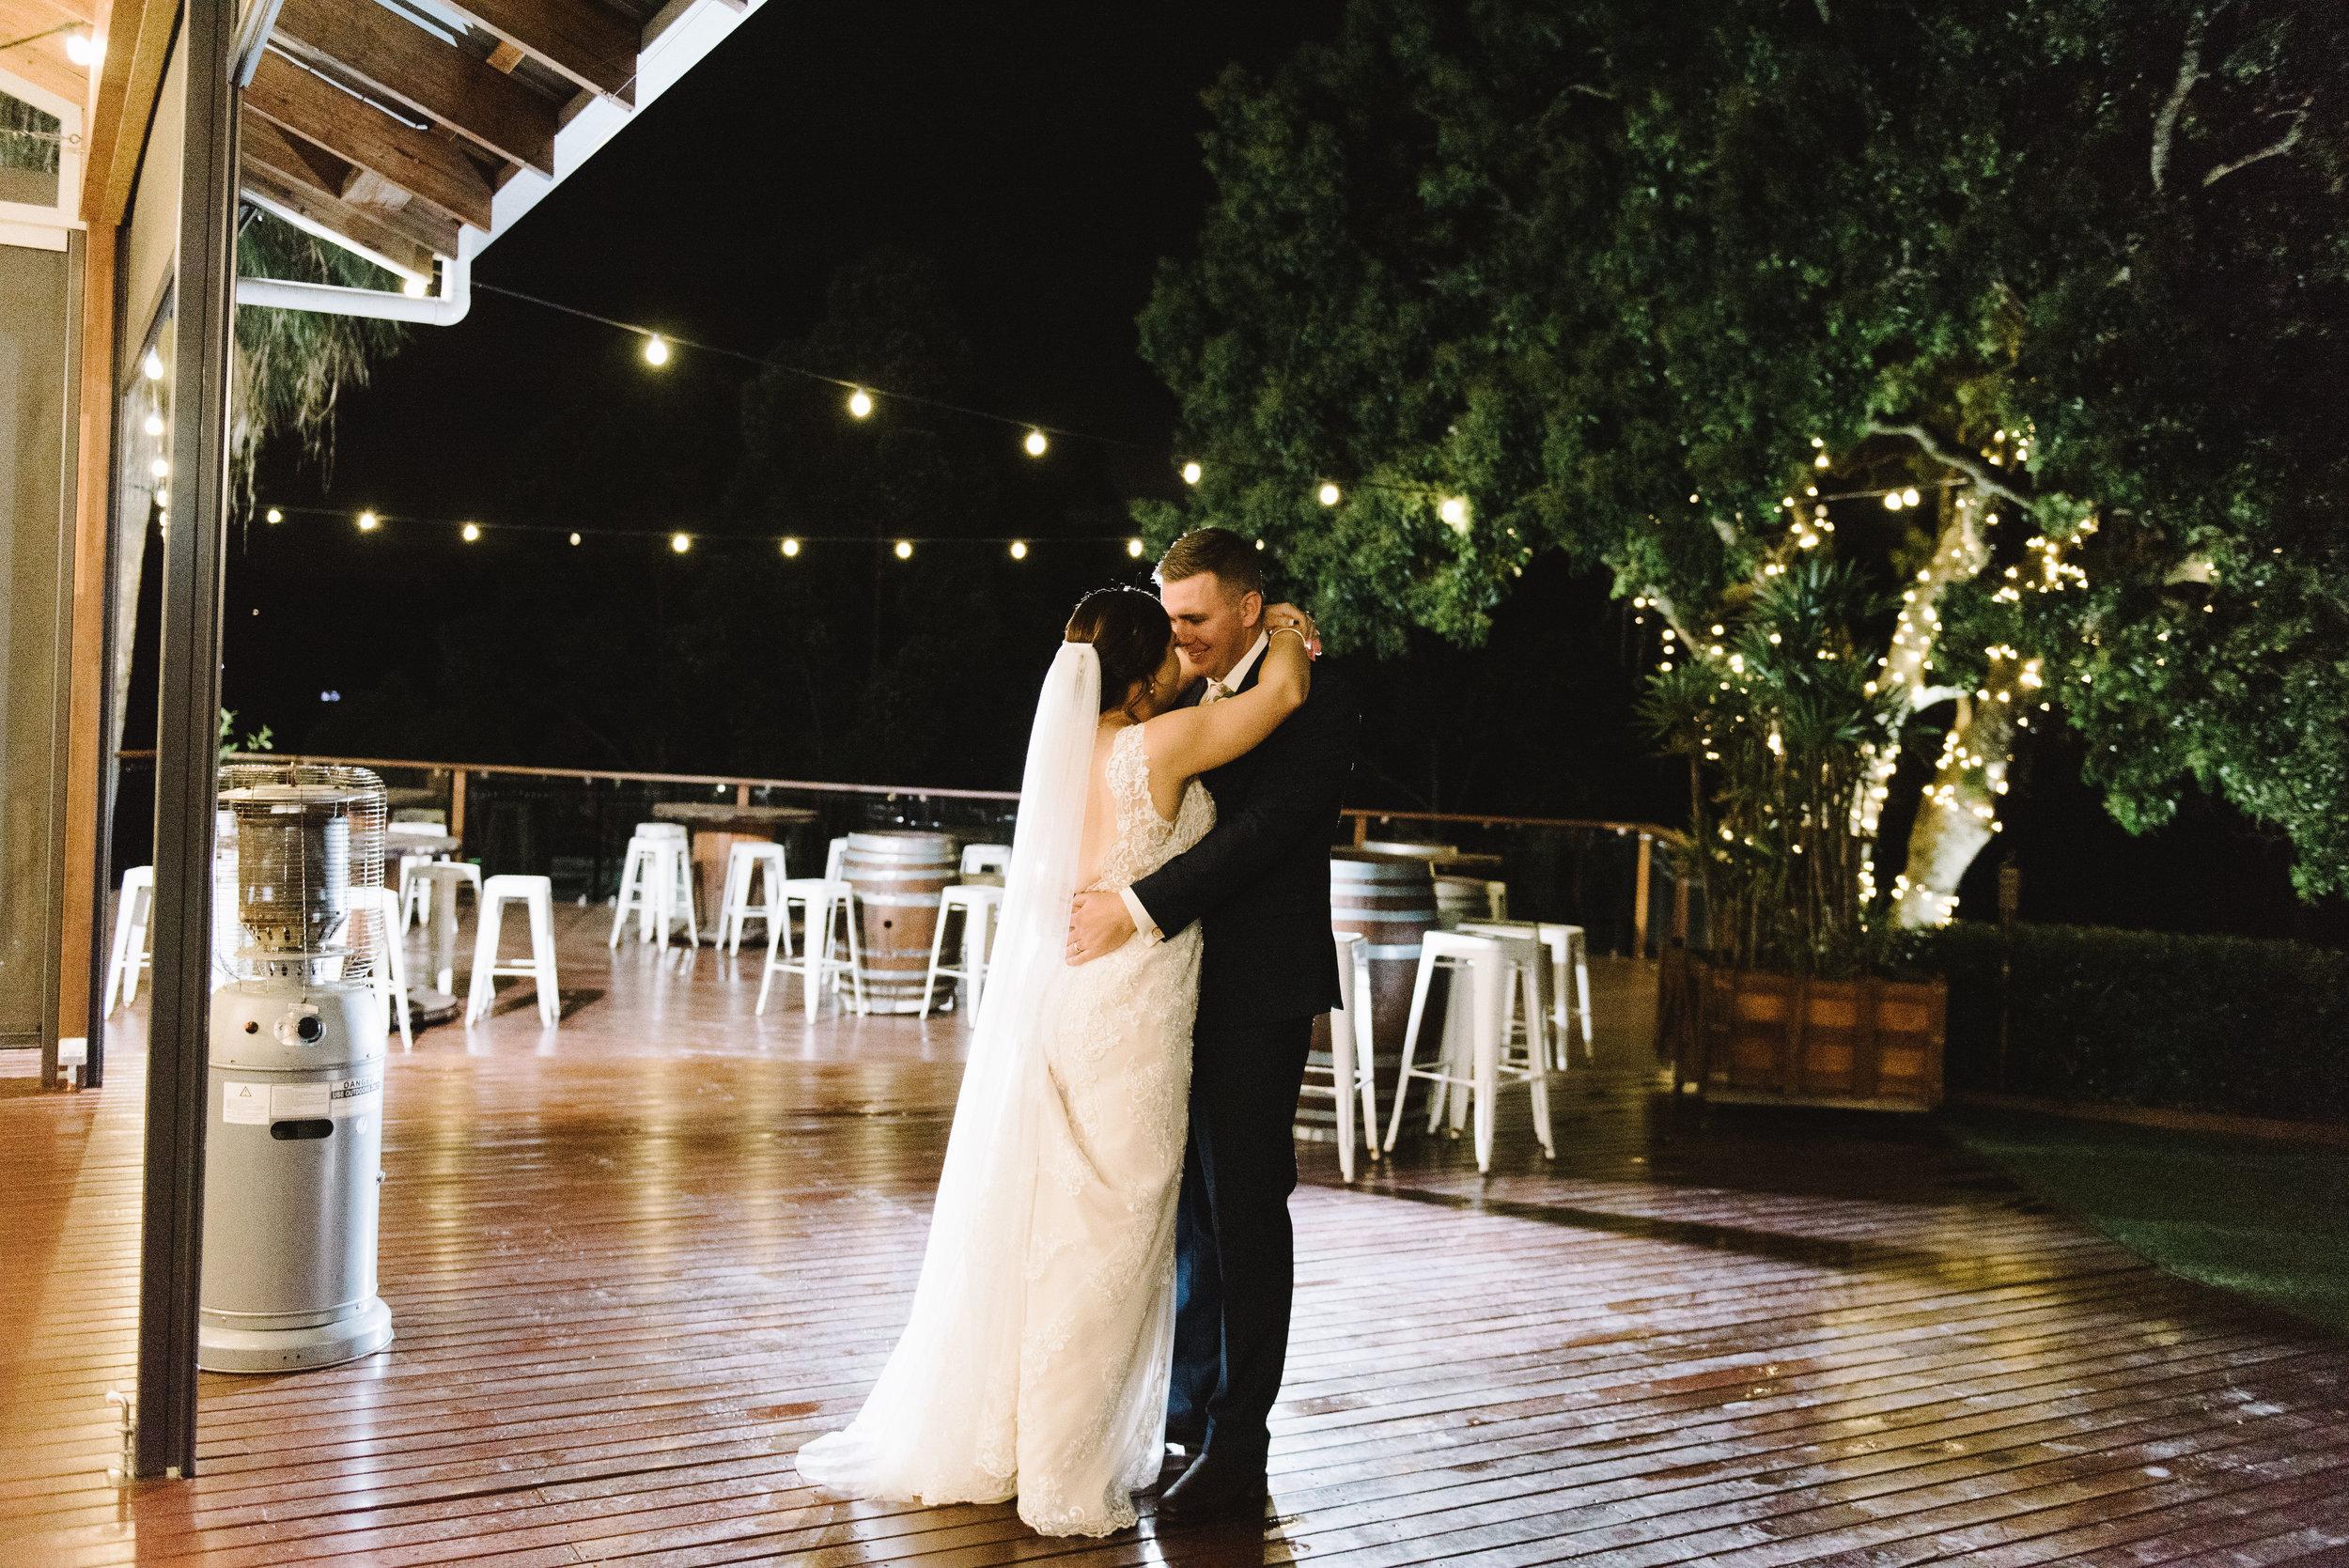 LAURENOLIVIA-austinvilla-estate-wedding-99.jpg